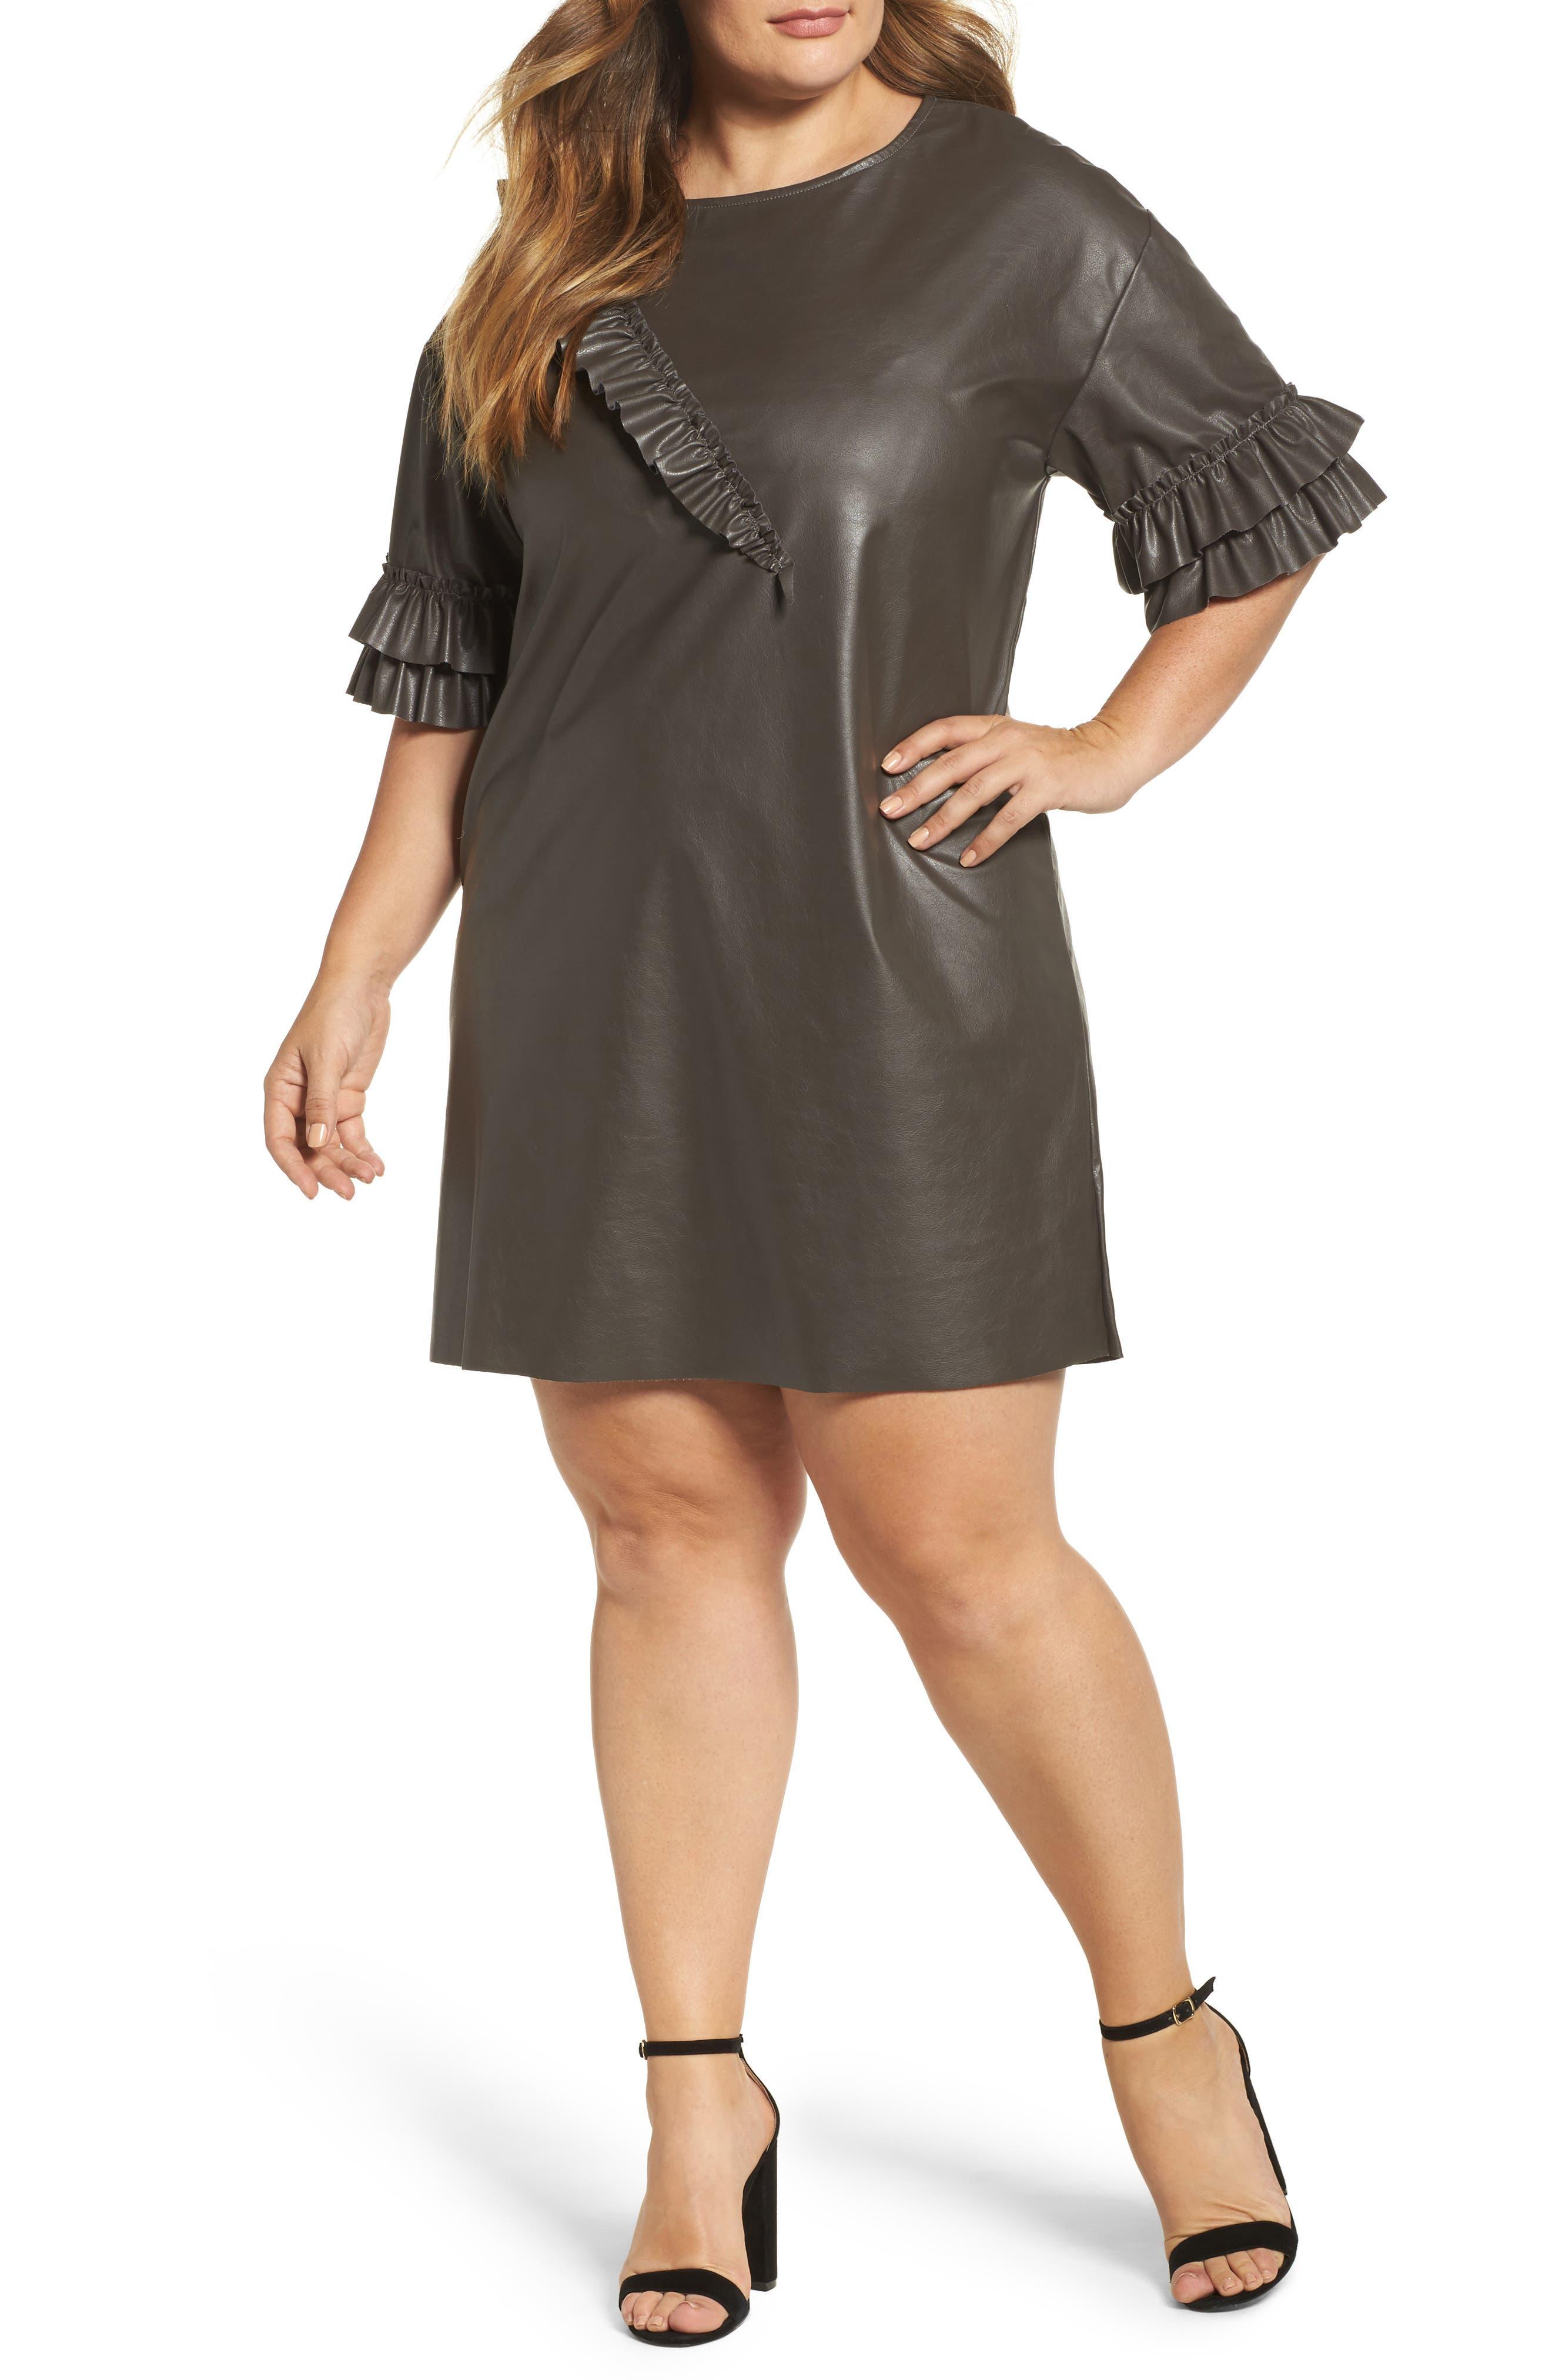 Alternate Image 1 Selected - ELVI Ruffle Shift Dress (Plus Size)